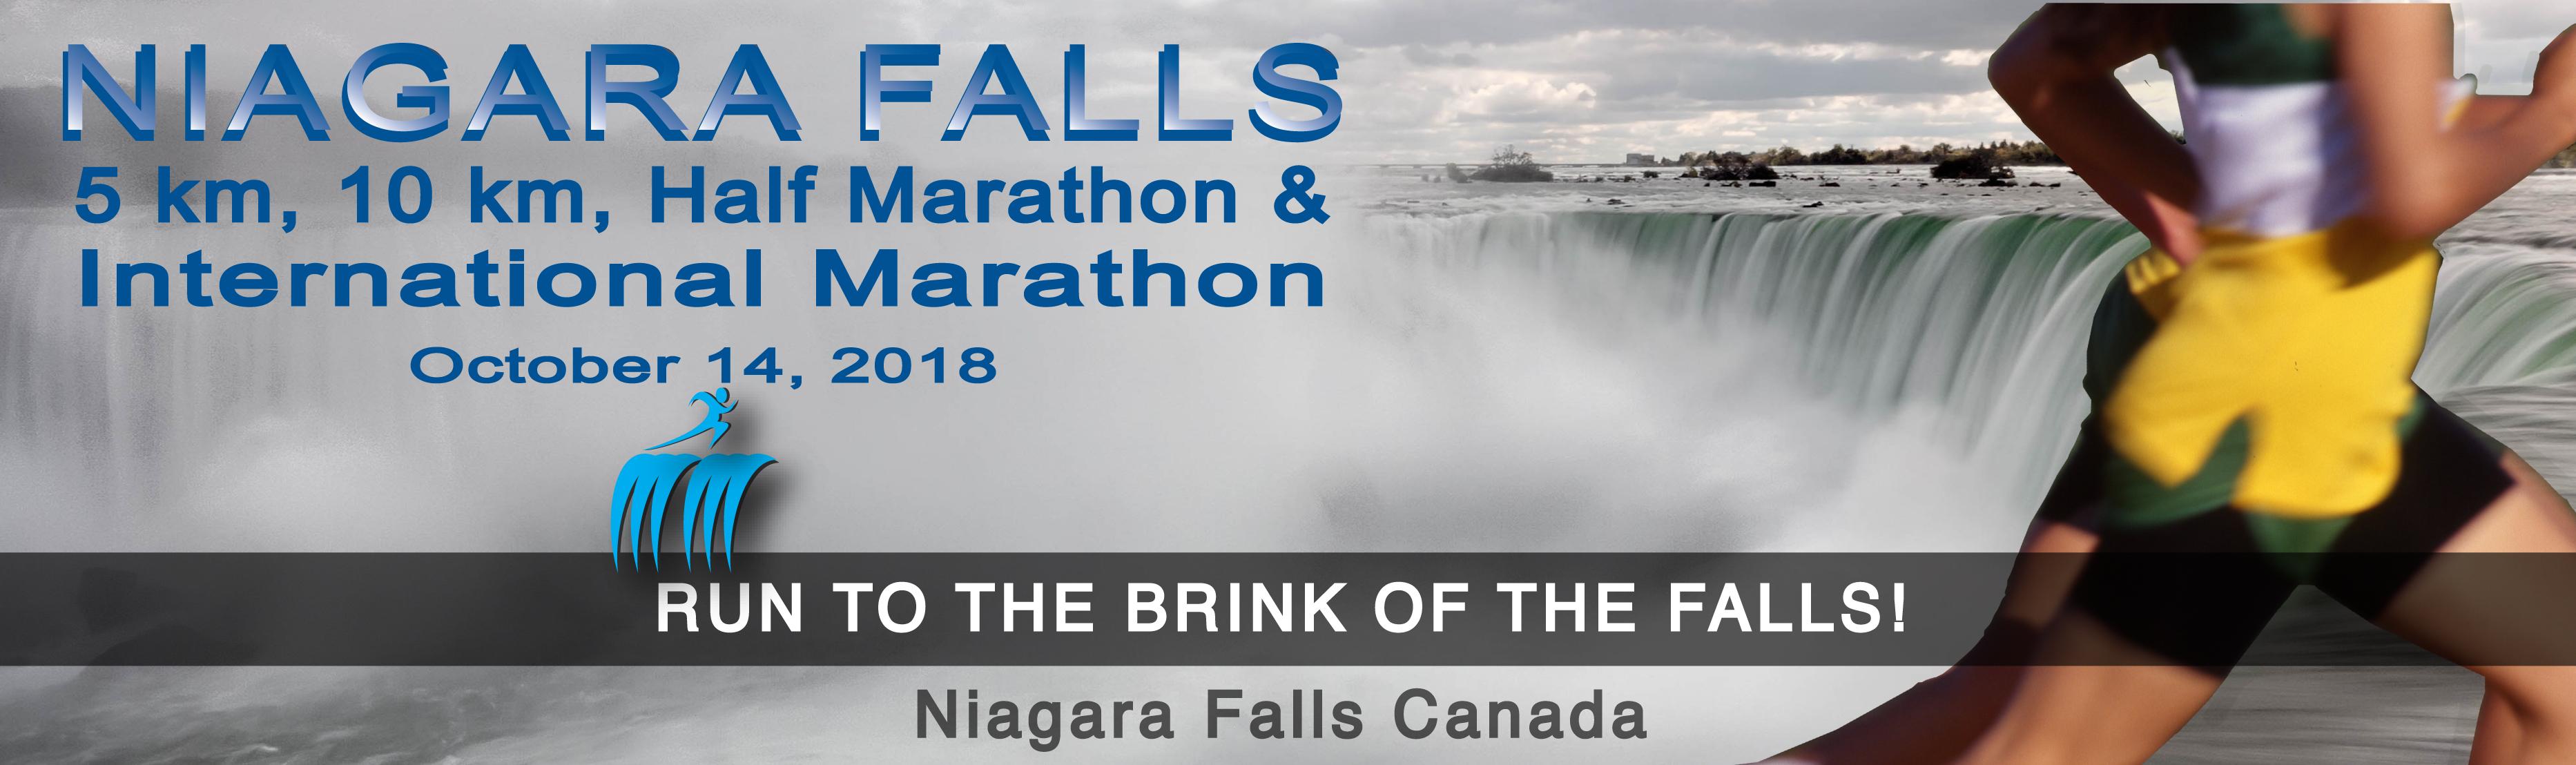 Niagara Falls 5k, 10k, Half & International Marathon Logo